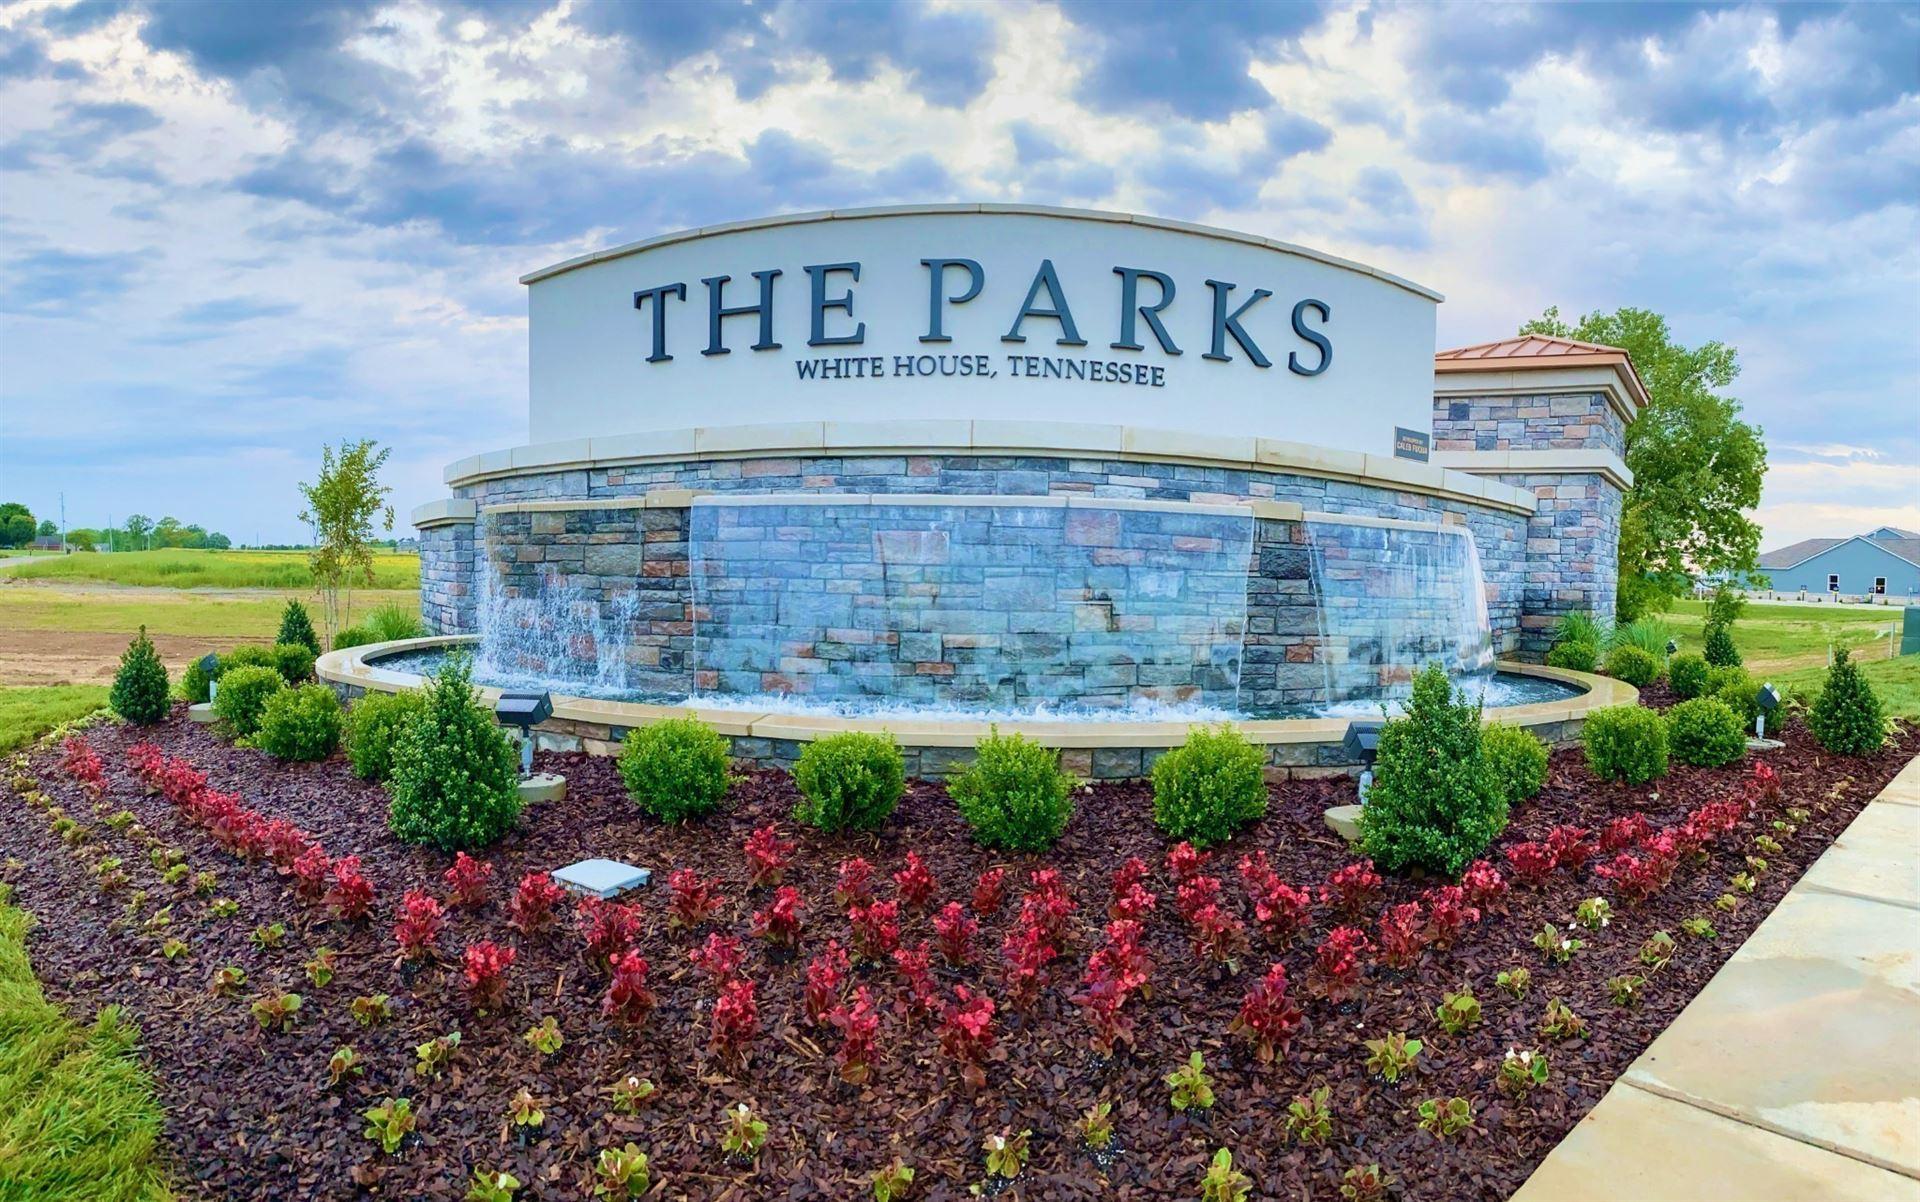 7060 Sunny Parks Dr, White House, TN 37188 - MLS#: 2205646